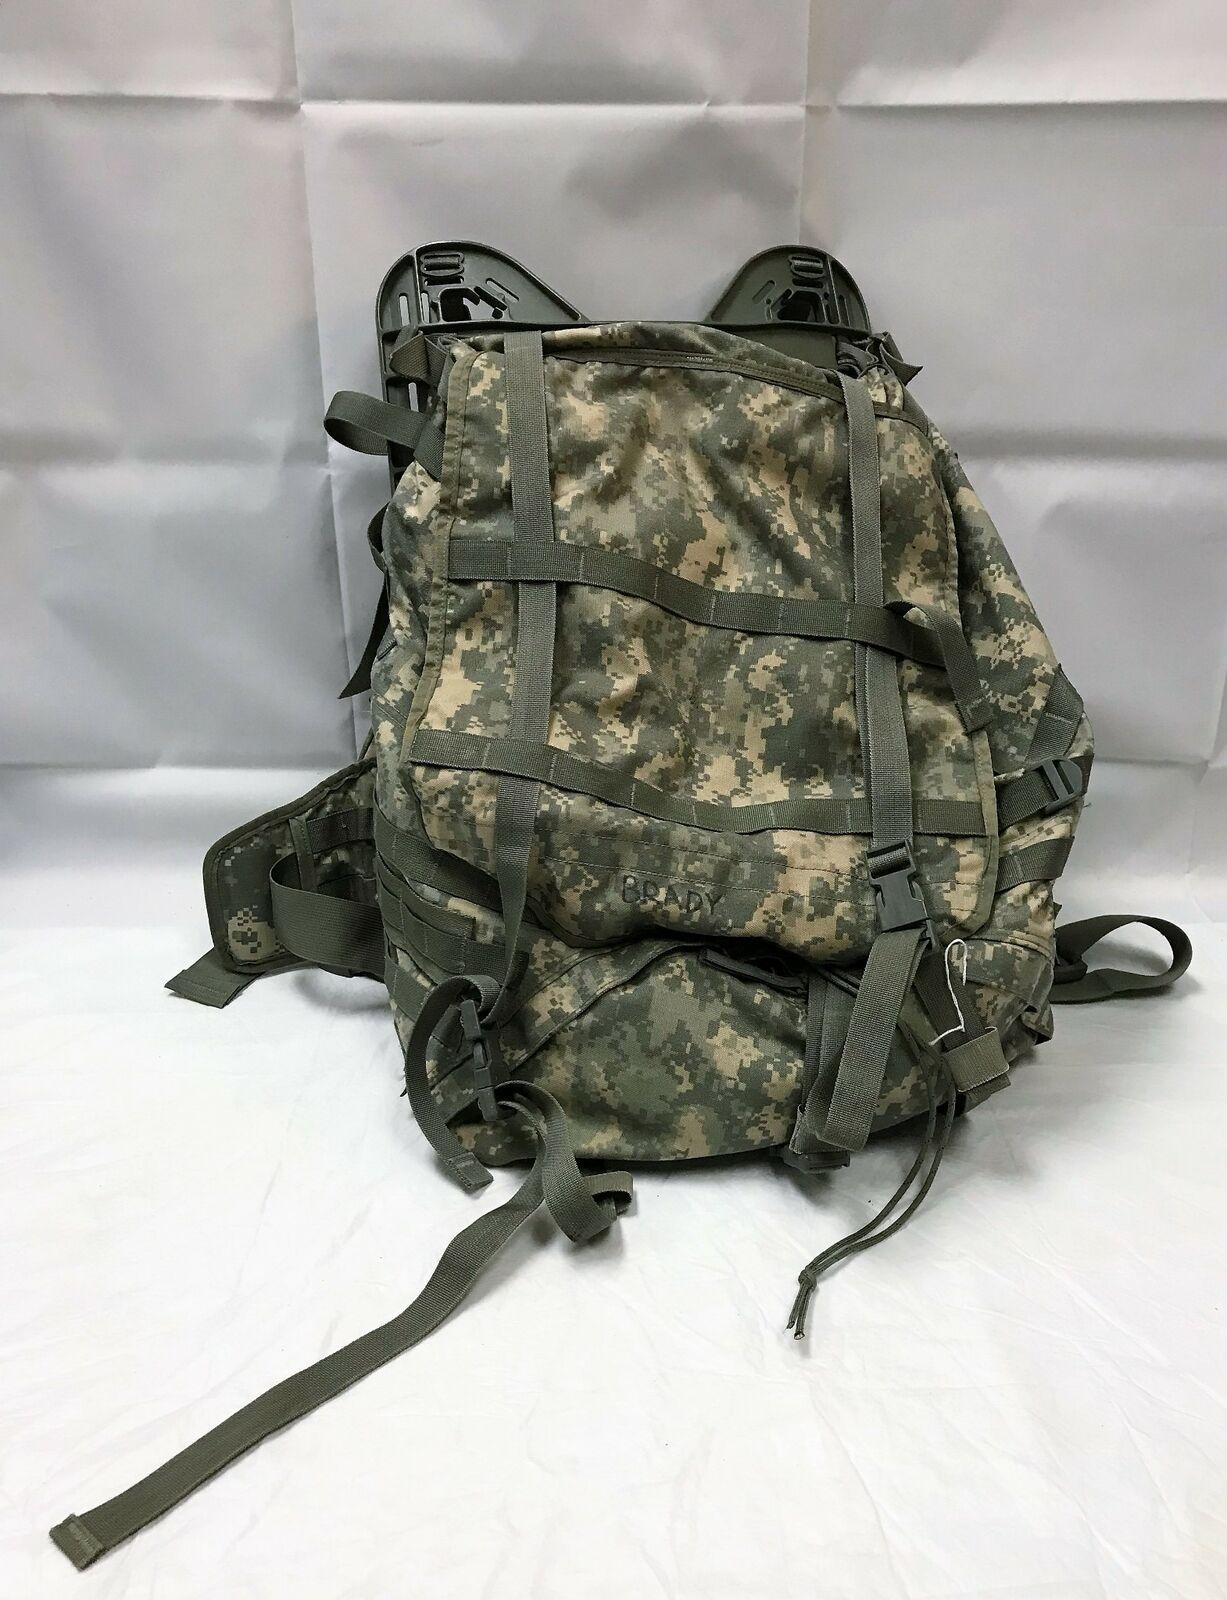 Large U.S. Army Military Grade ACU Molle II Rucksack Backpack With Frame